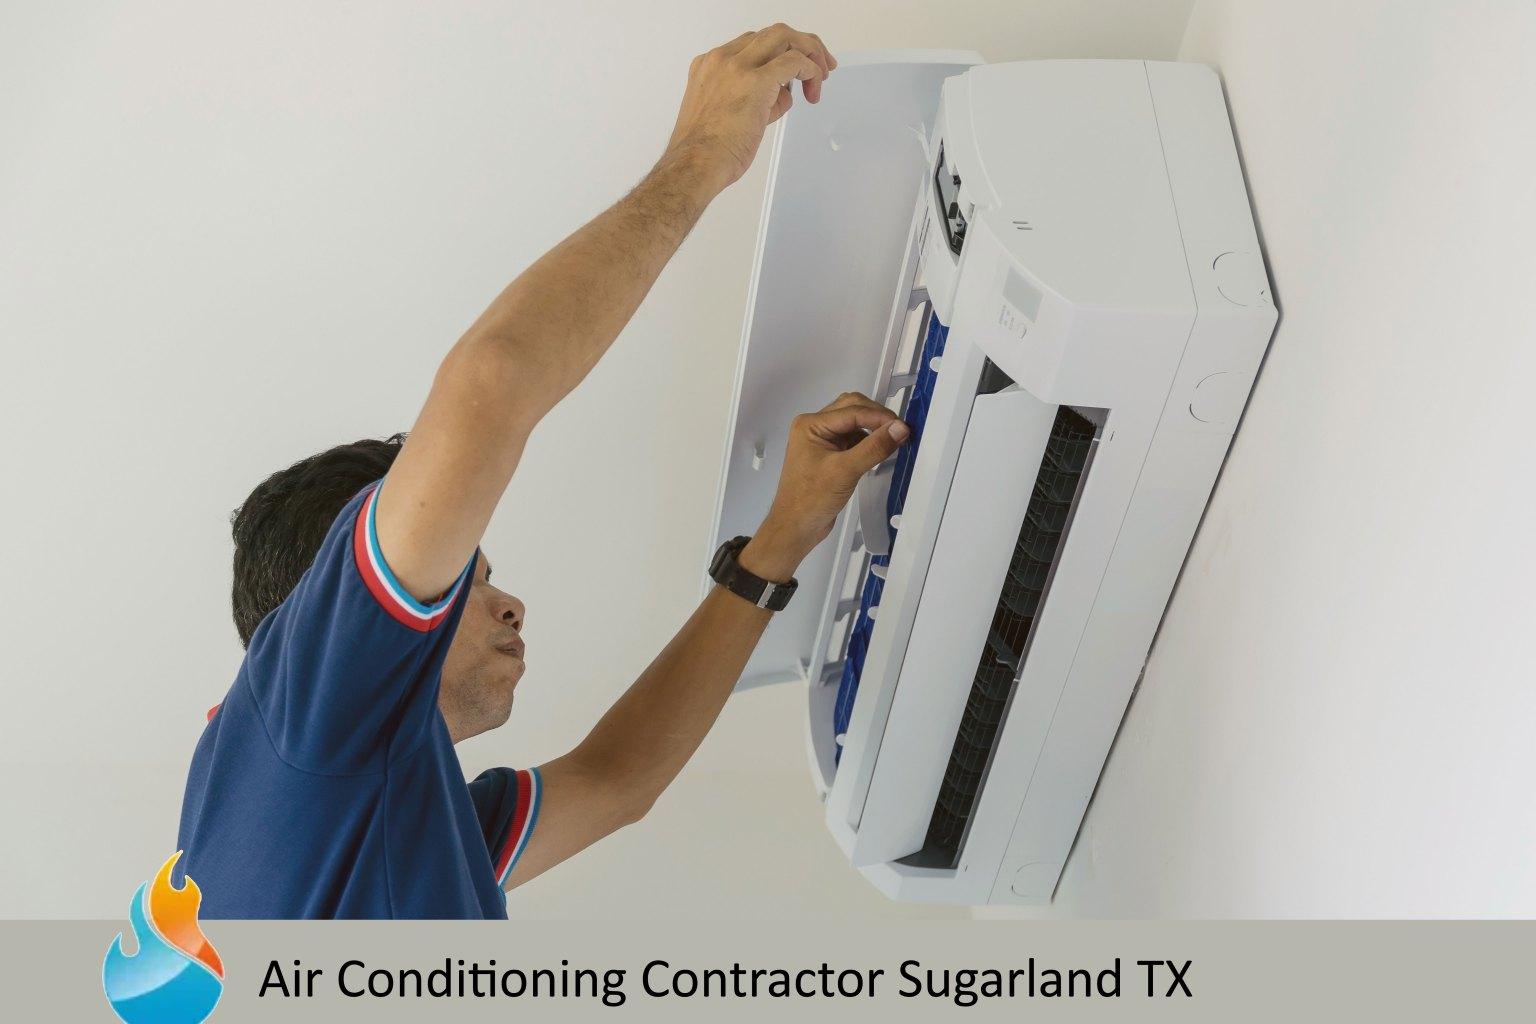 Air Conditioning Contractor SugarLand